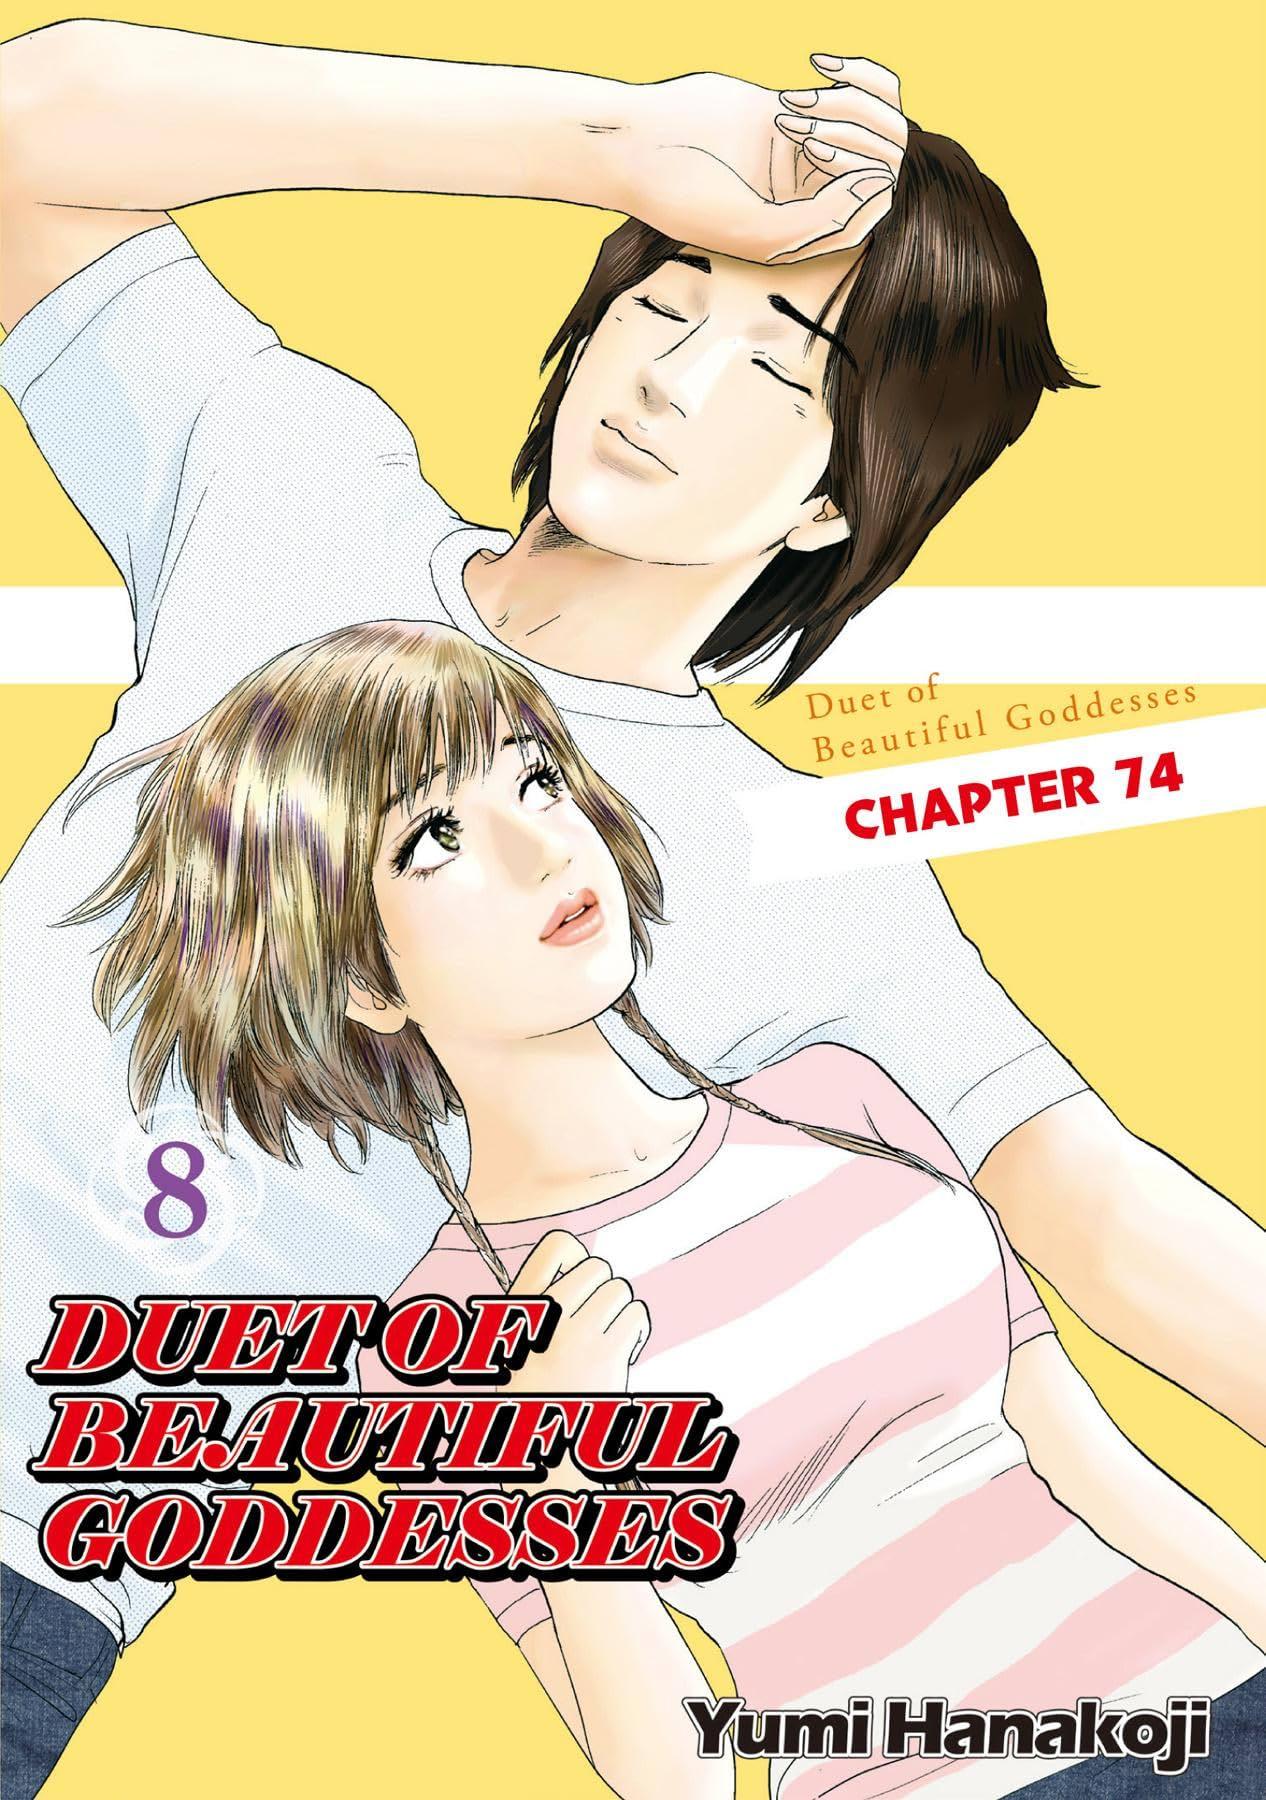 DUET OF BEAUTIFUL GODDESSES #74